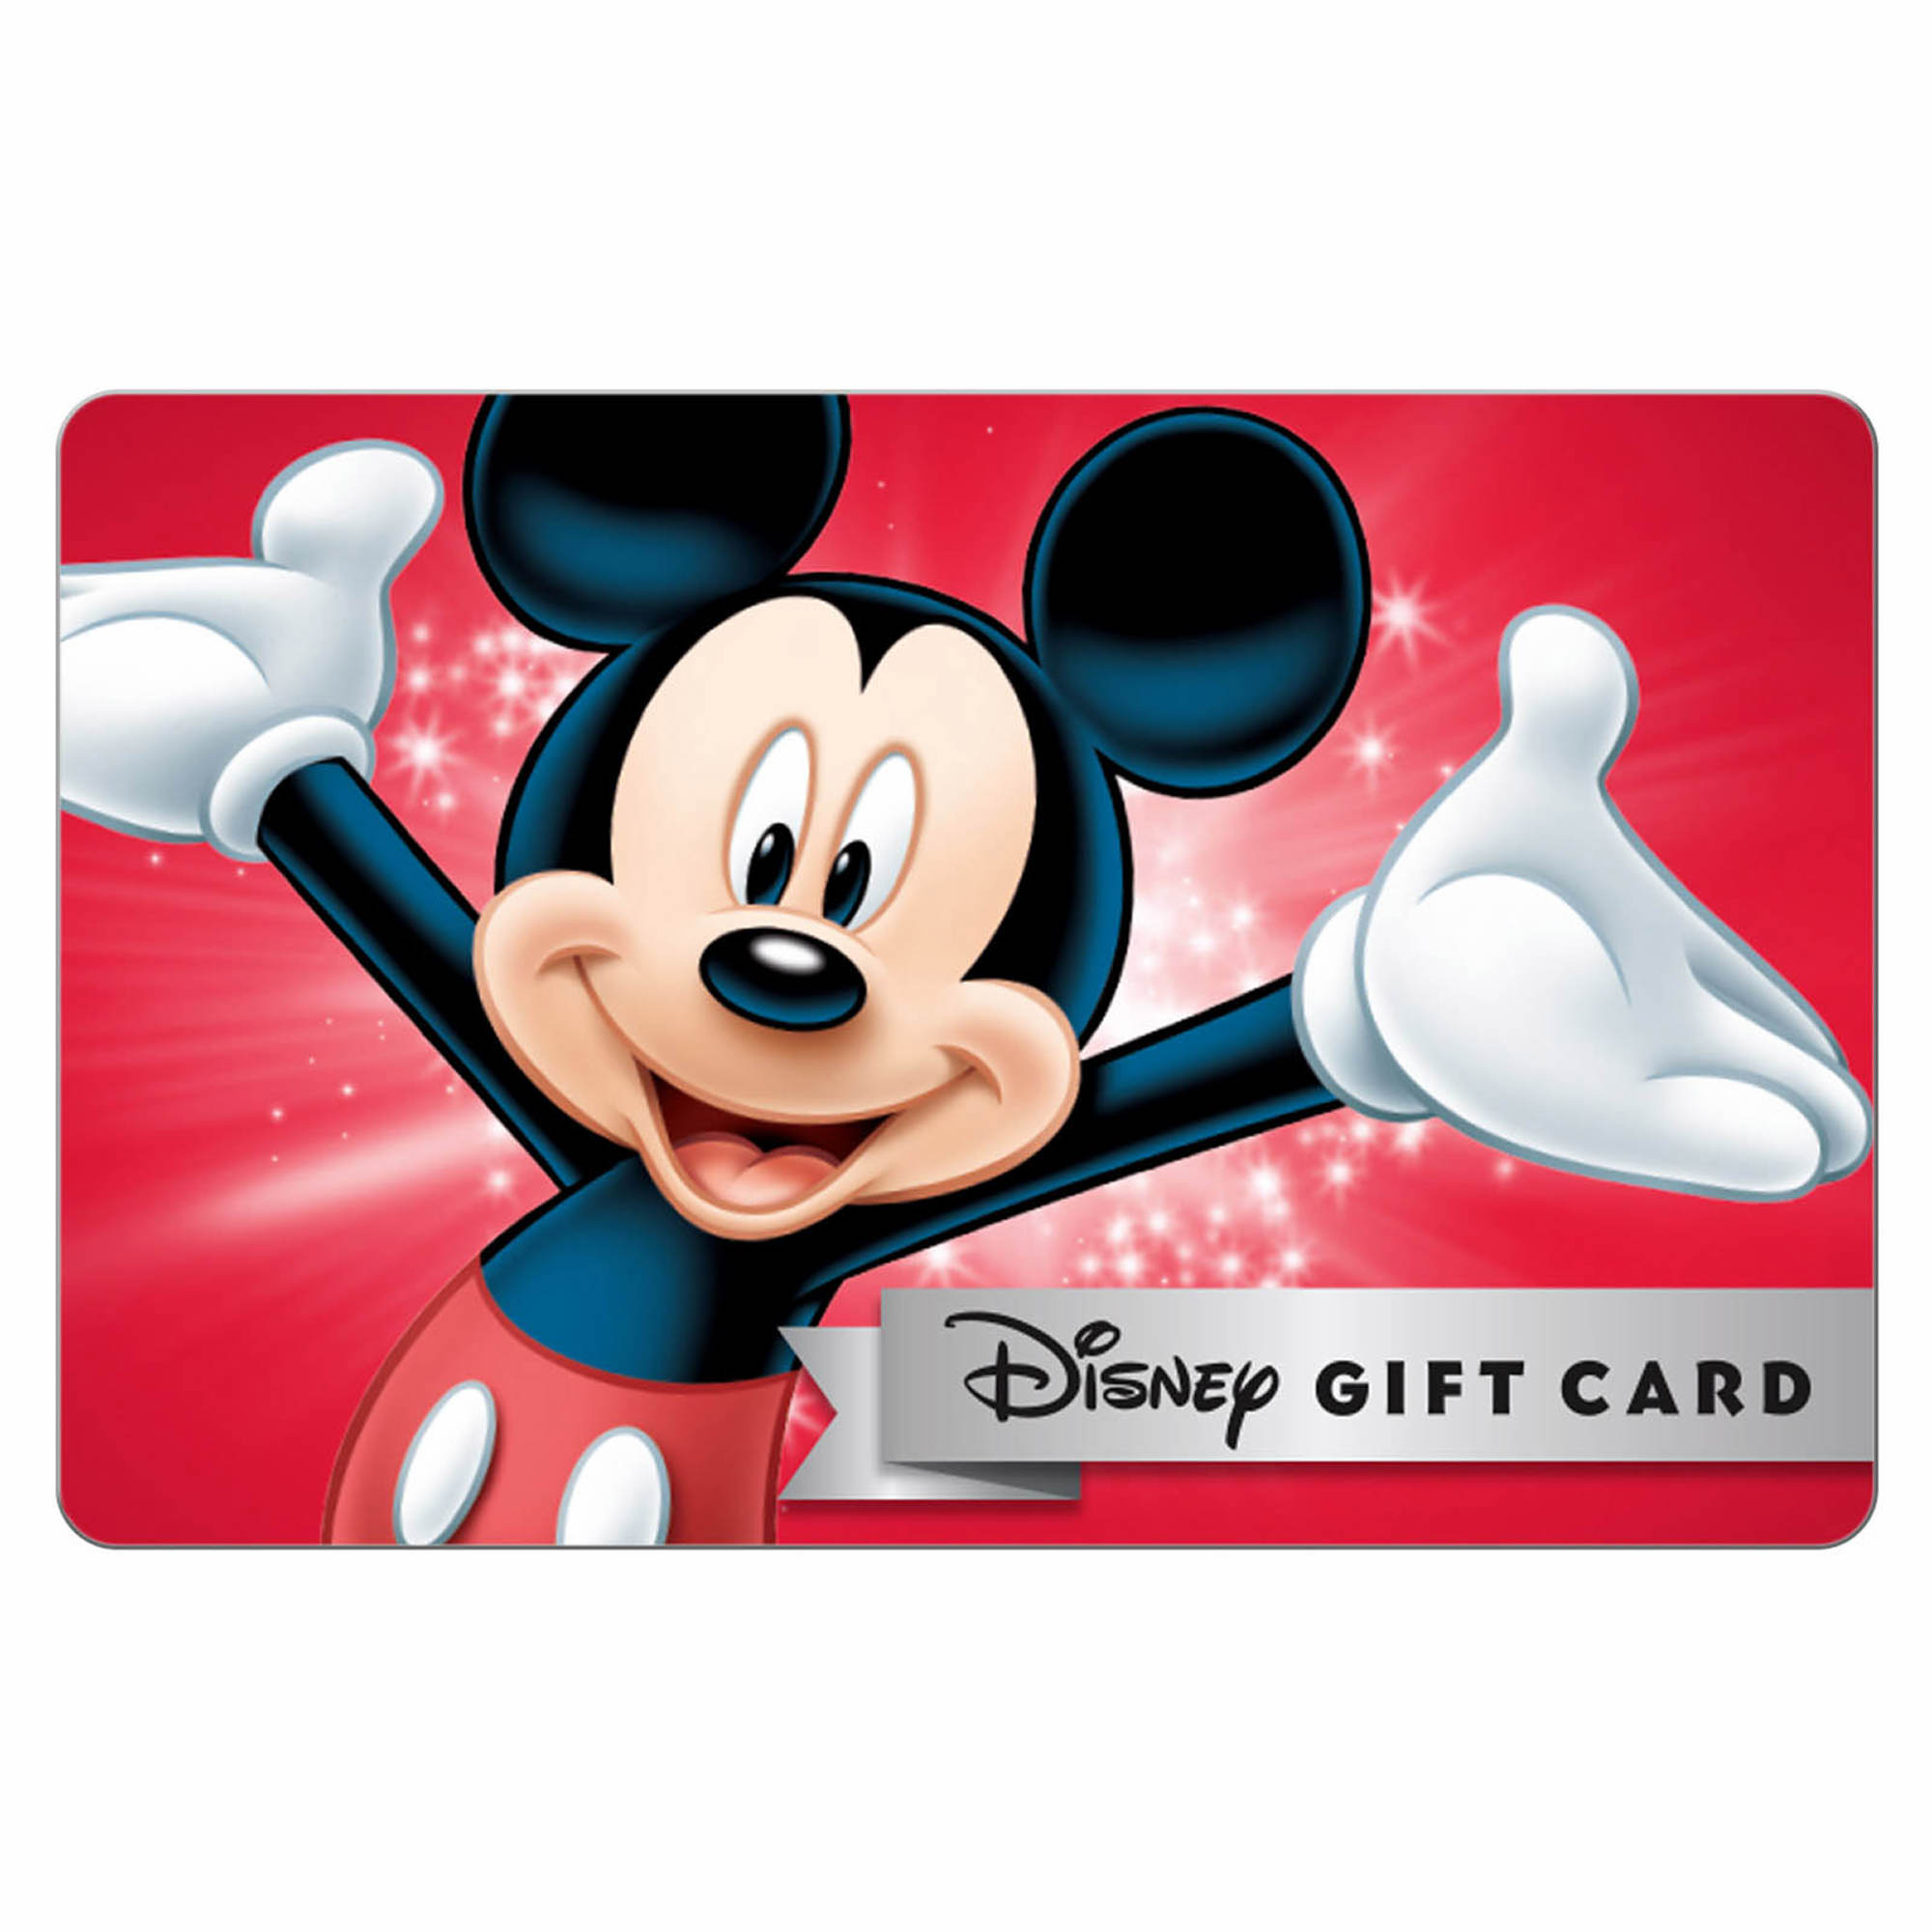 $100 Disney Gift Card - BJs WholeSale Club